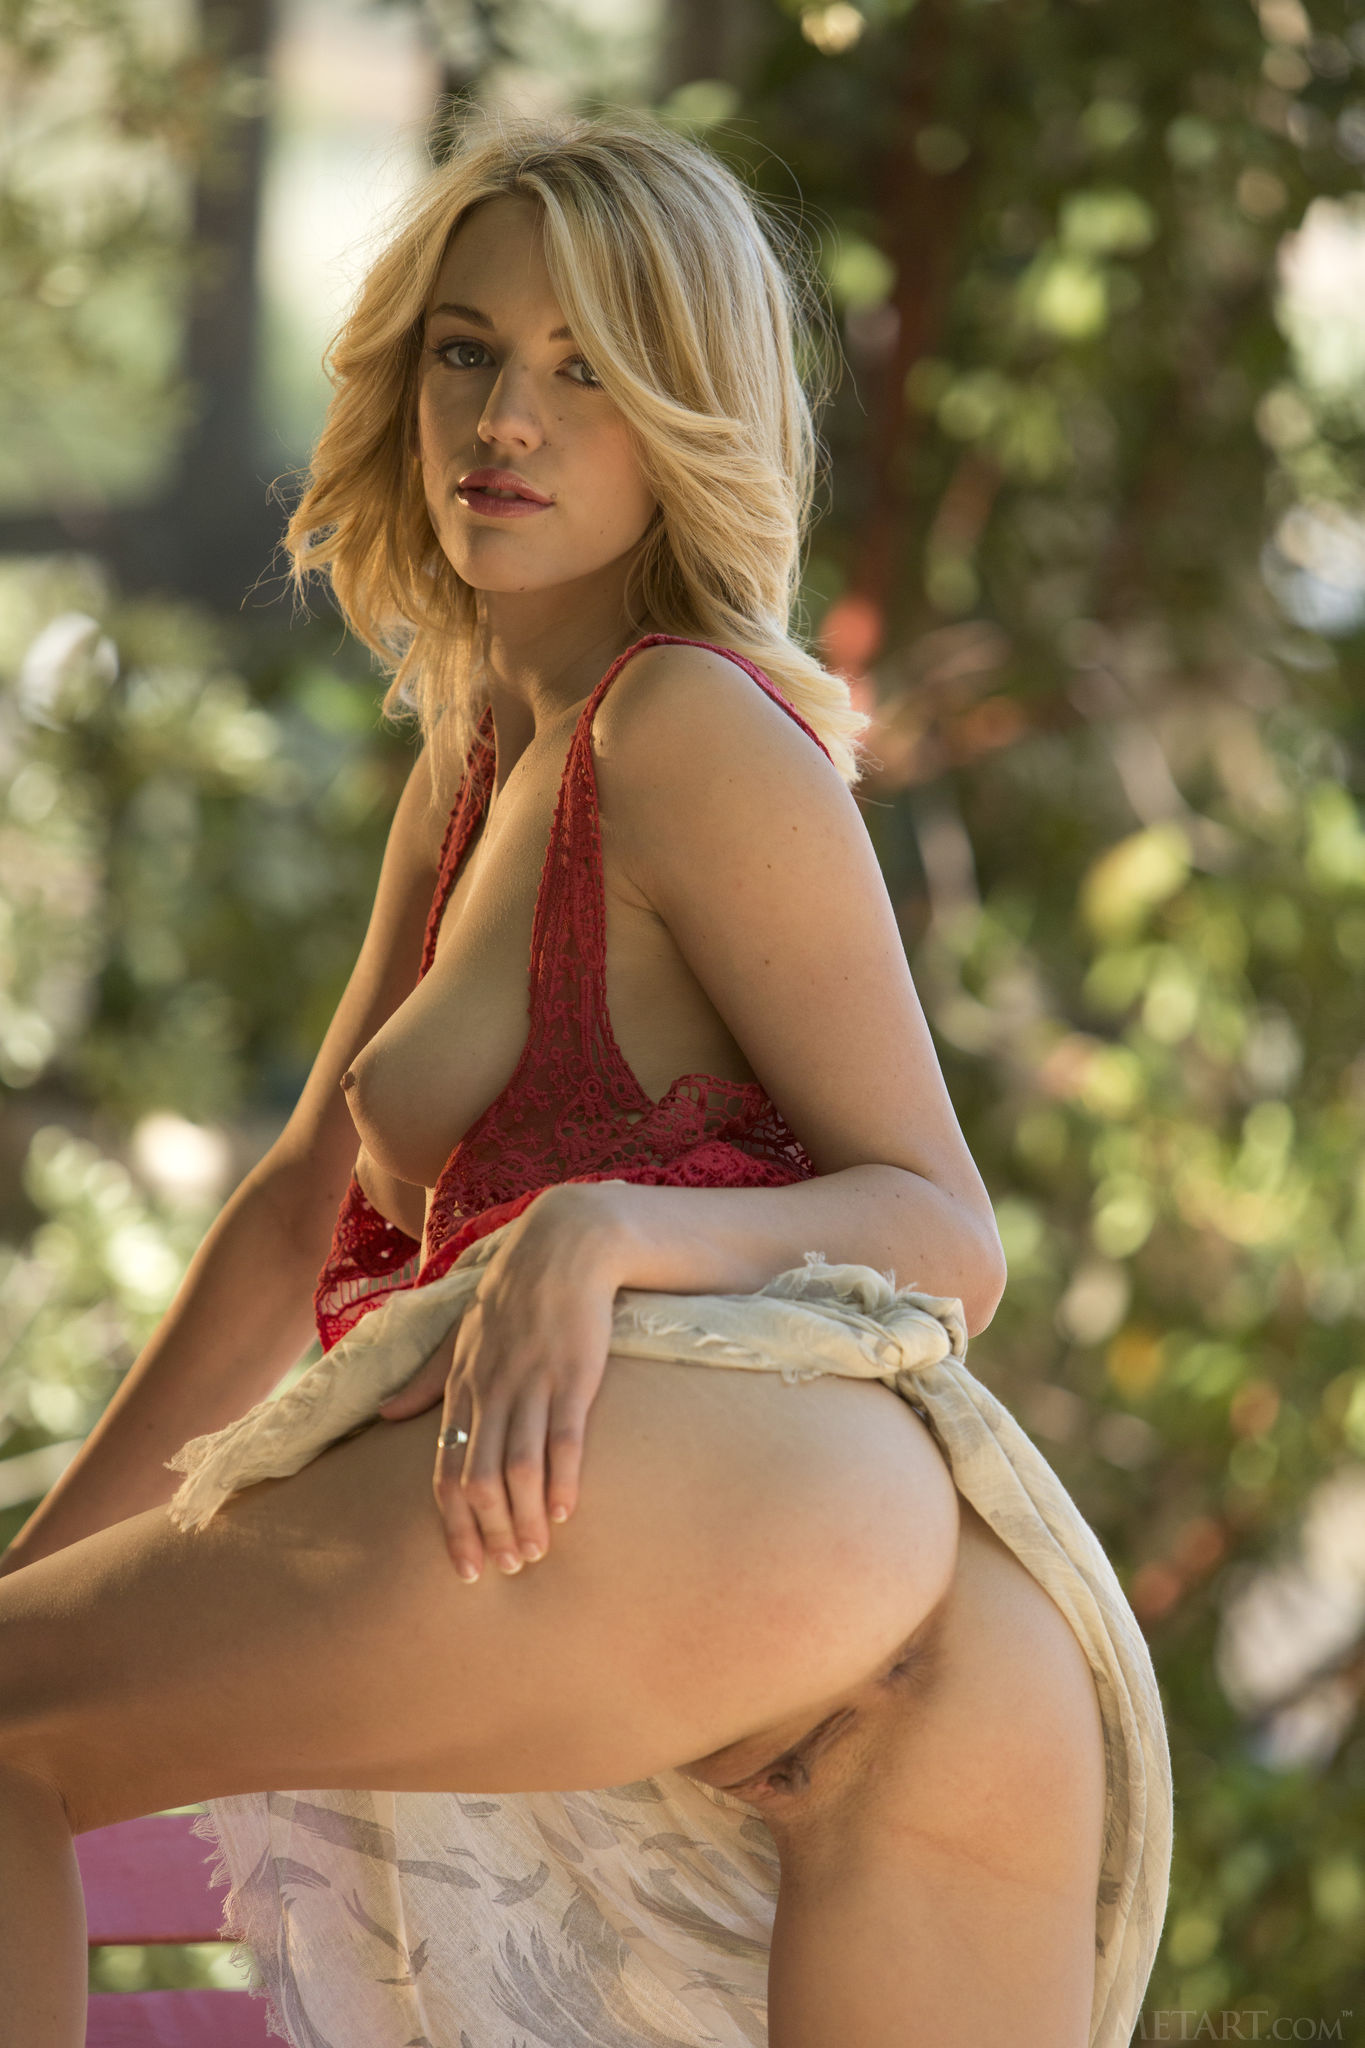 Blake bartelli porn